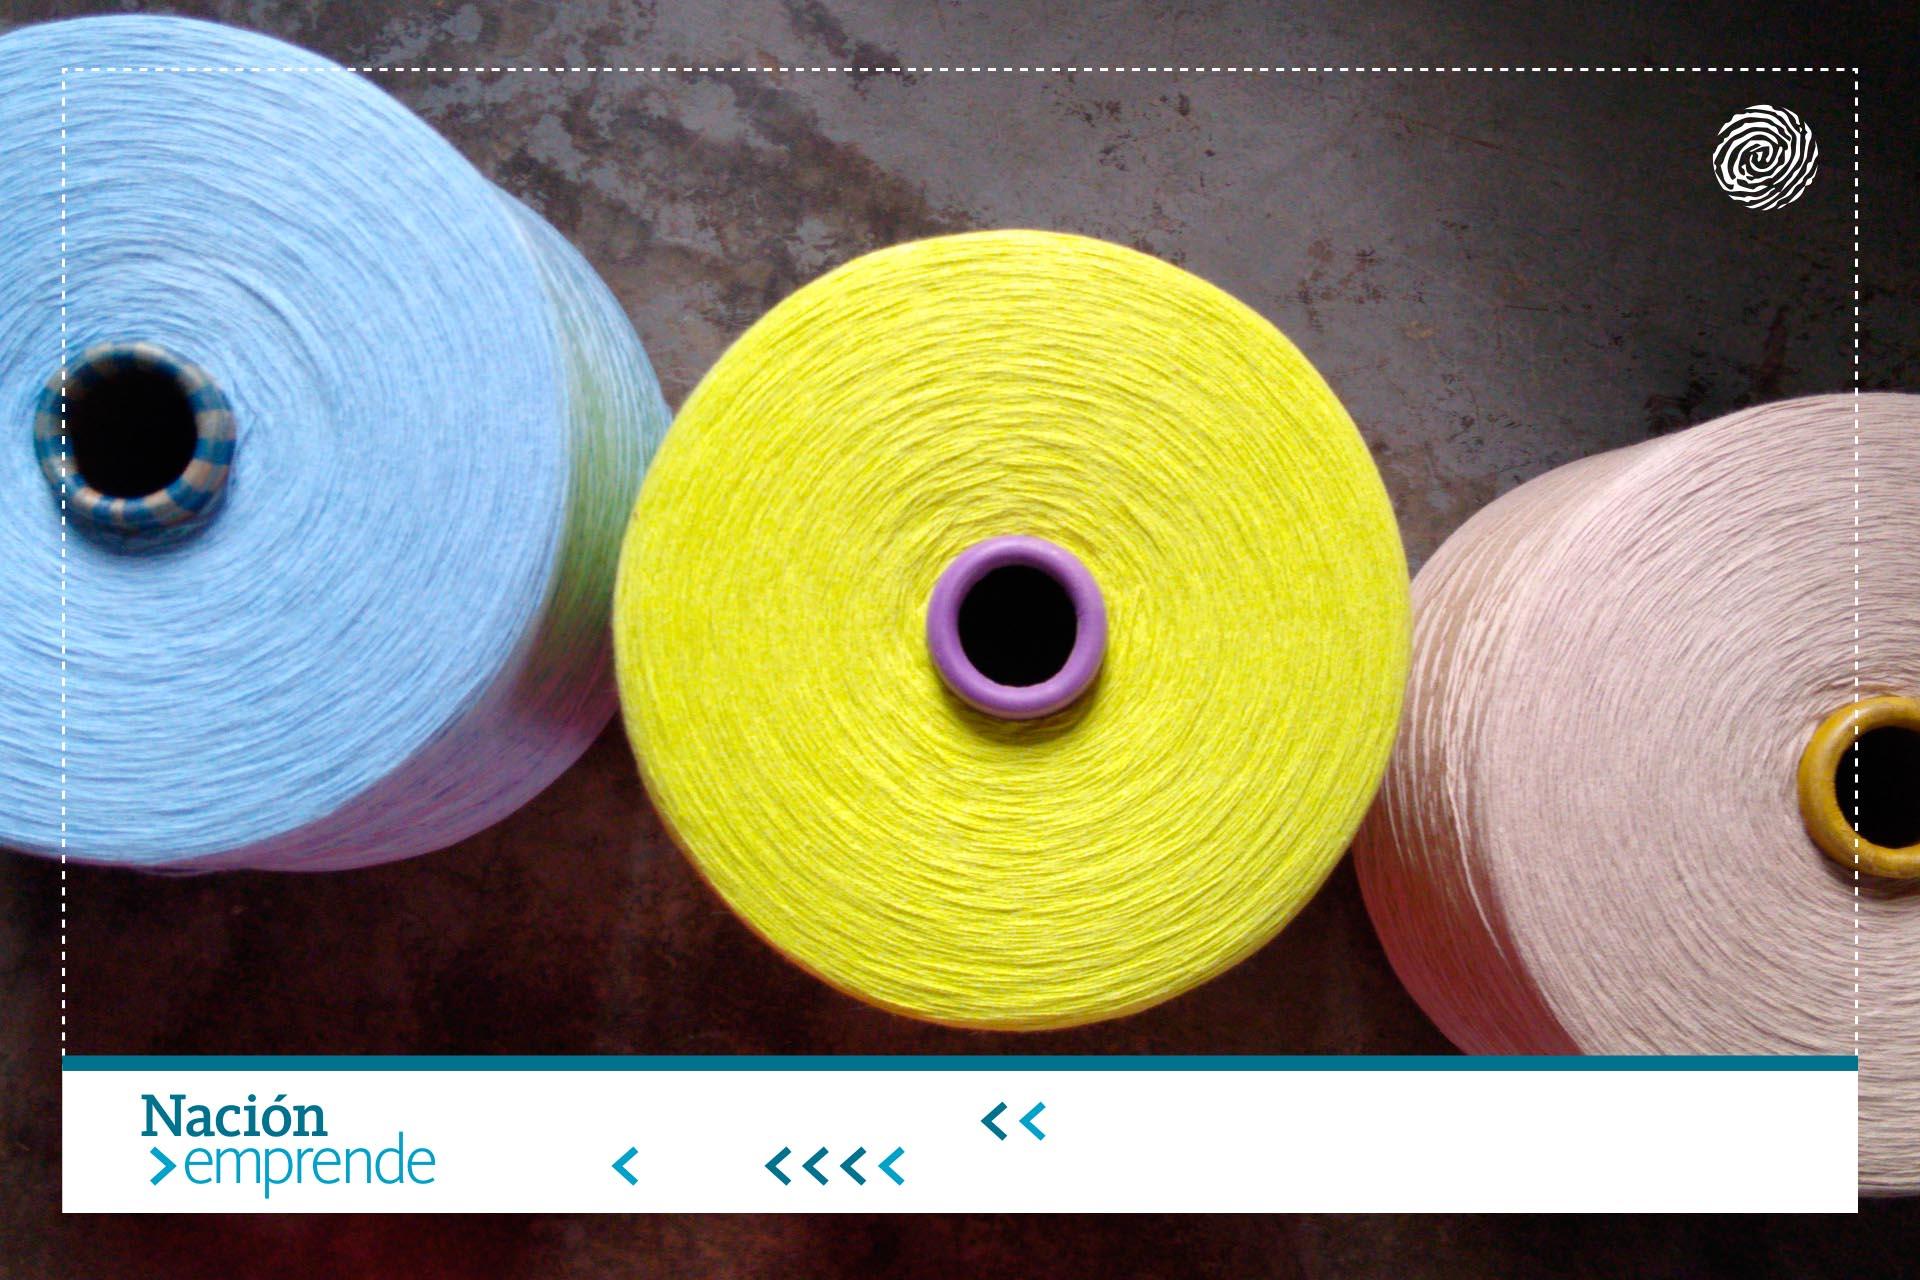 Lana, la materia prima de abriles de lana